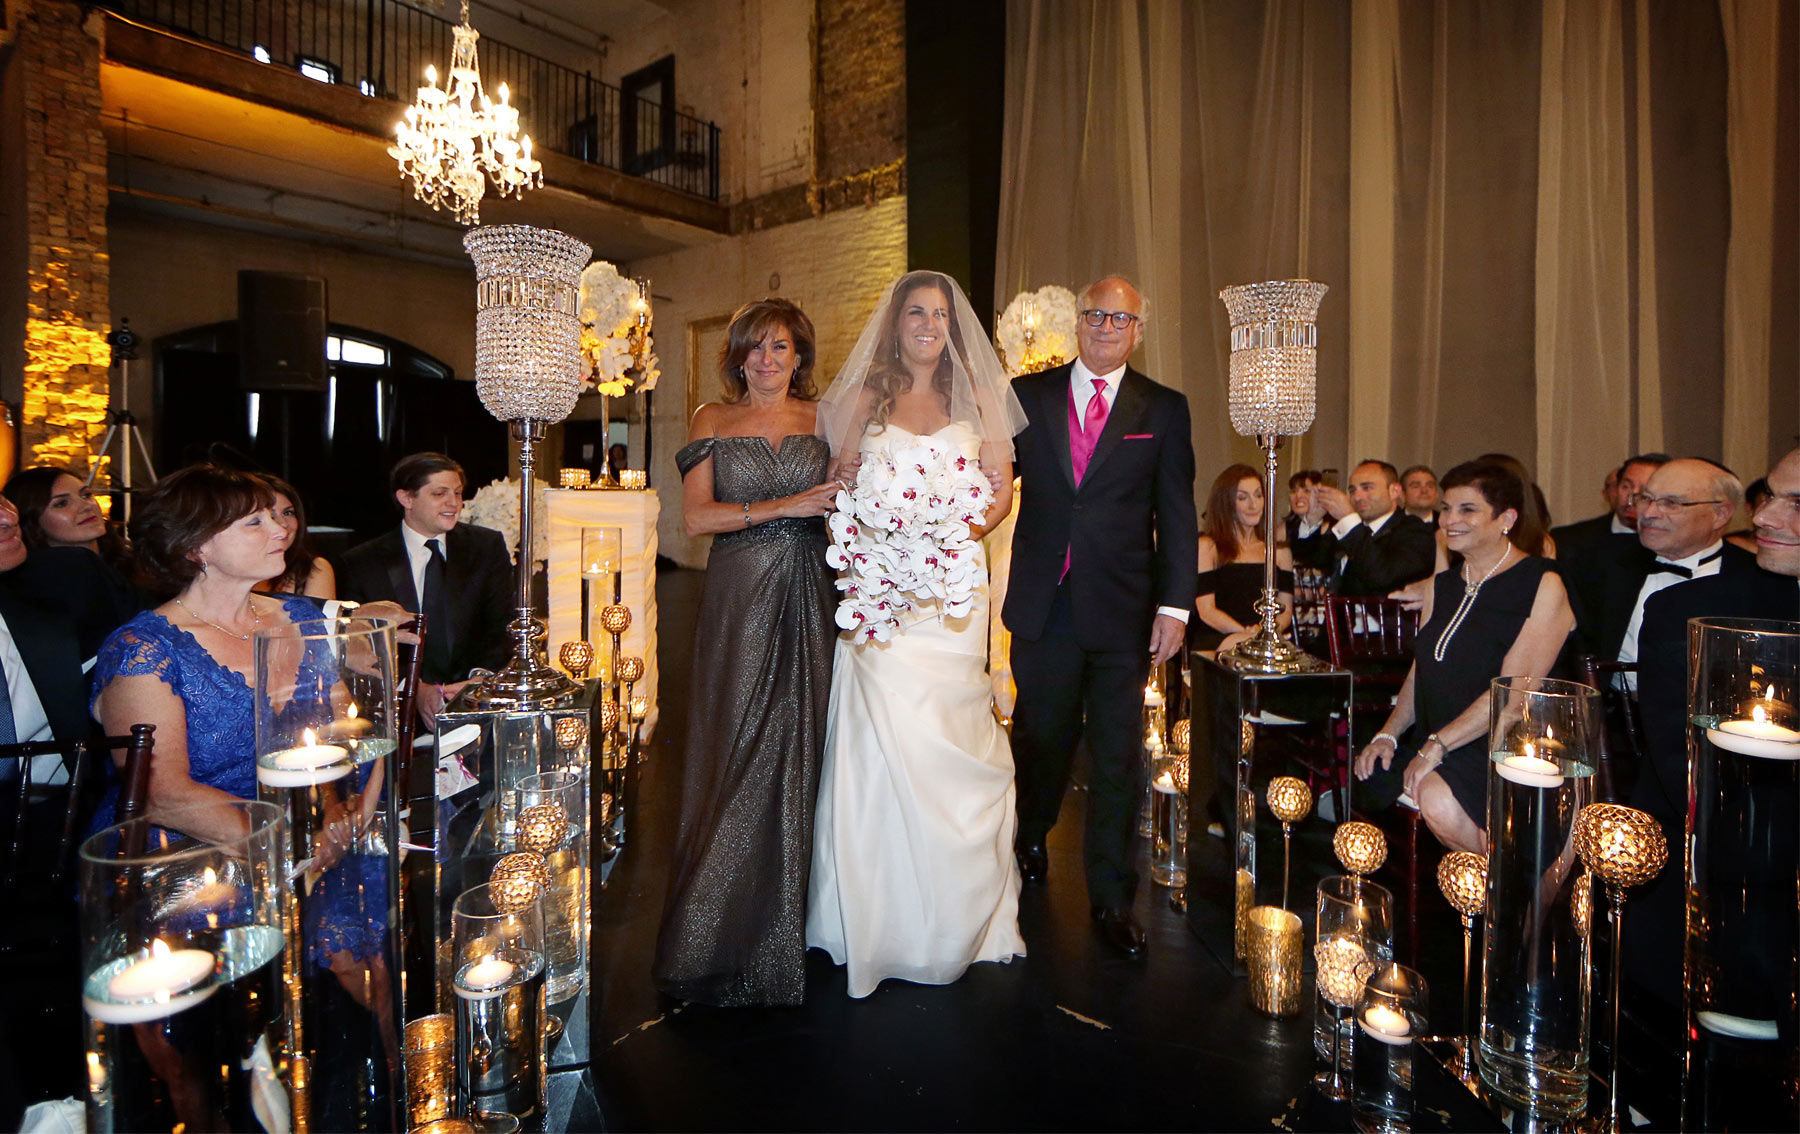 08-Minneapolis-Minnesota-Wedding-Photography-by-Vick-Photography-Aria-Downtown-Ceremony-Layne-&-Dan.jpg